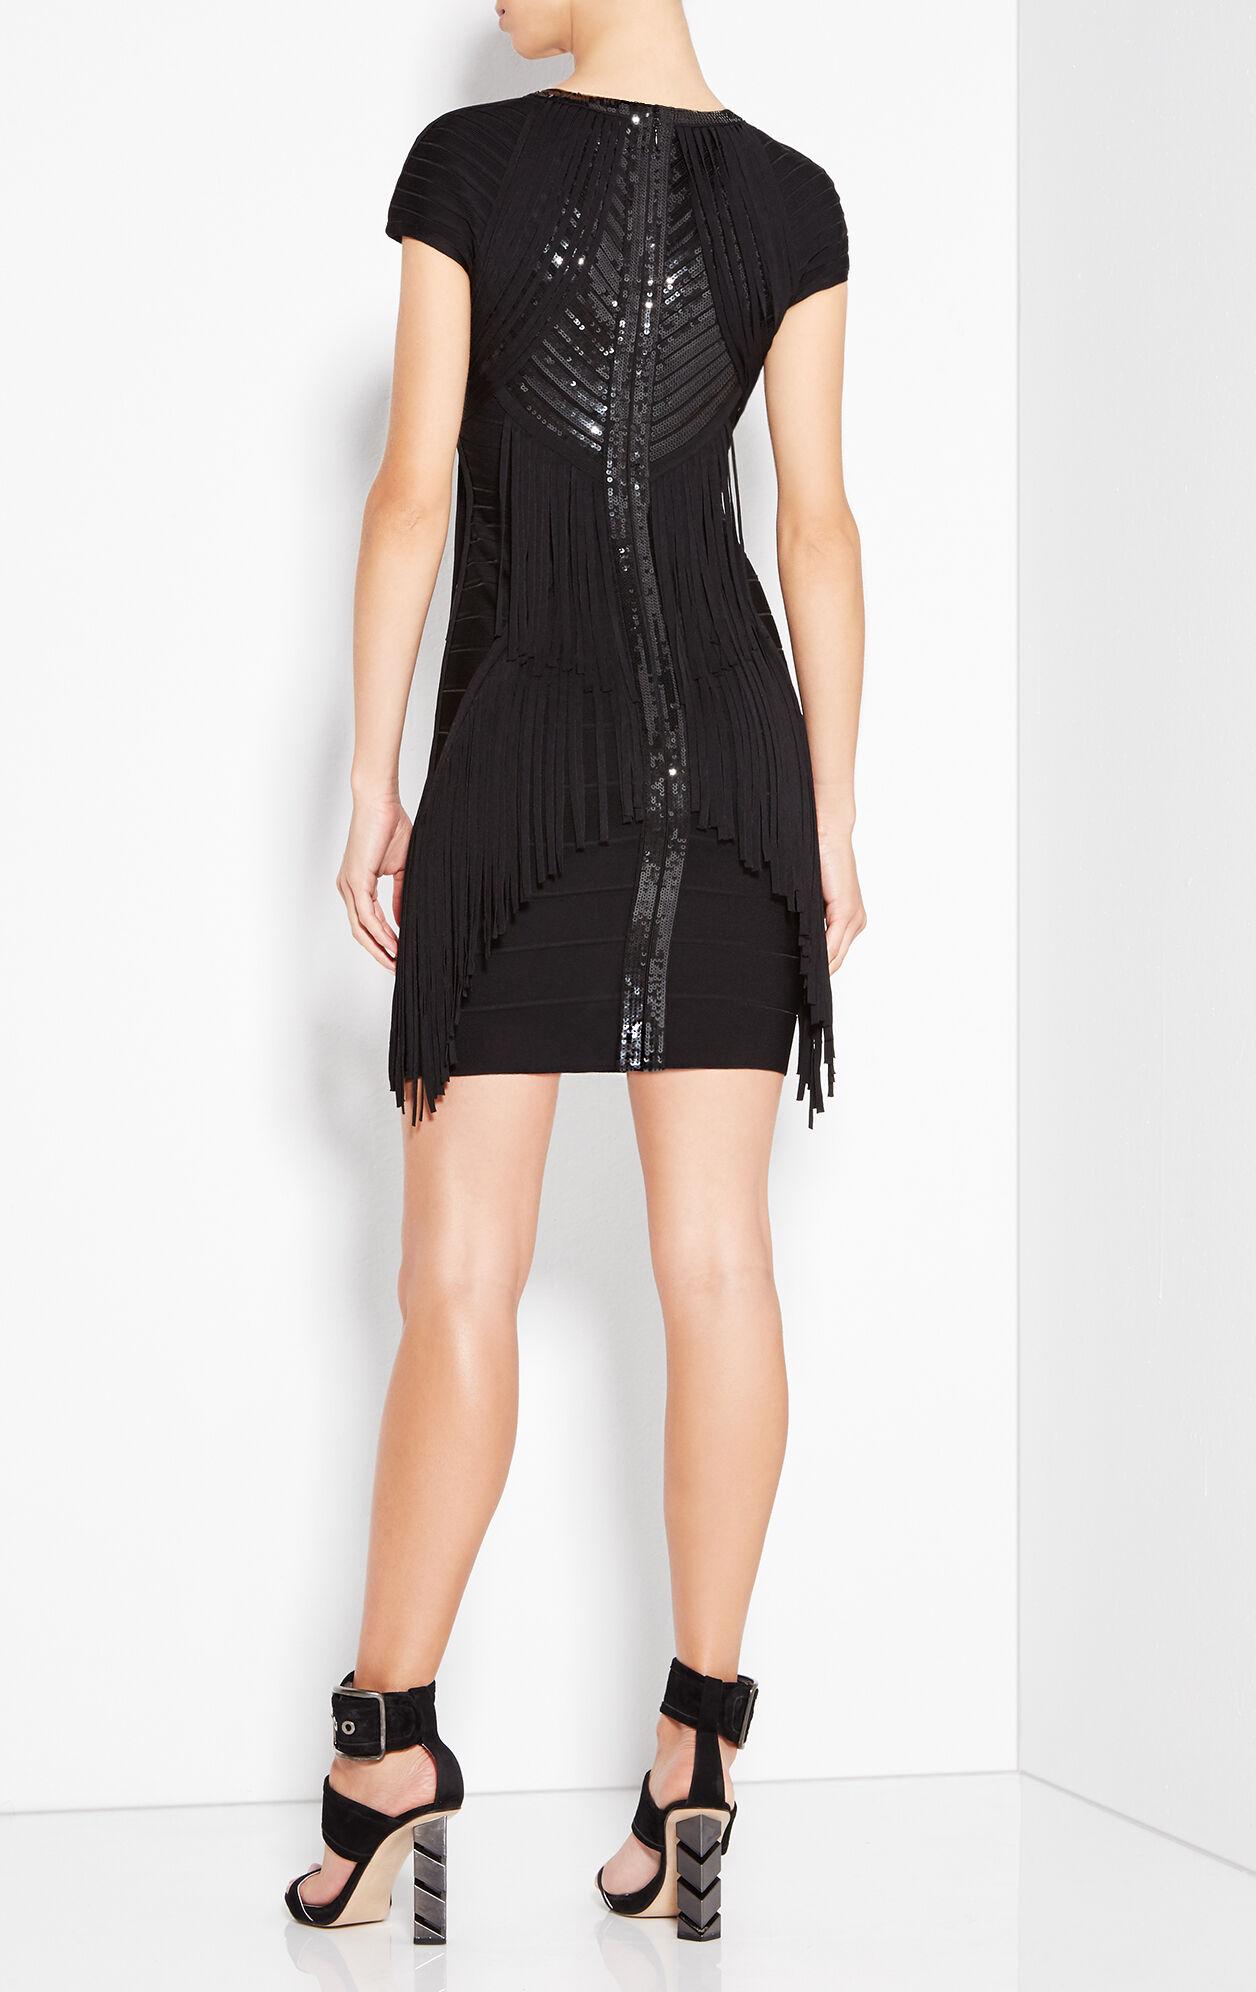 Kassidy Sequined Fringe Dress